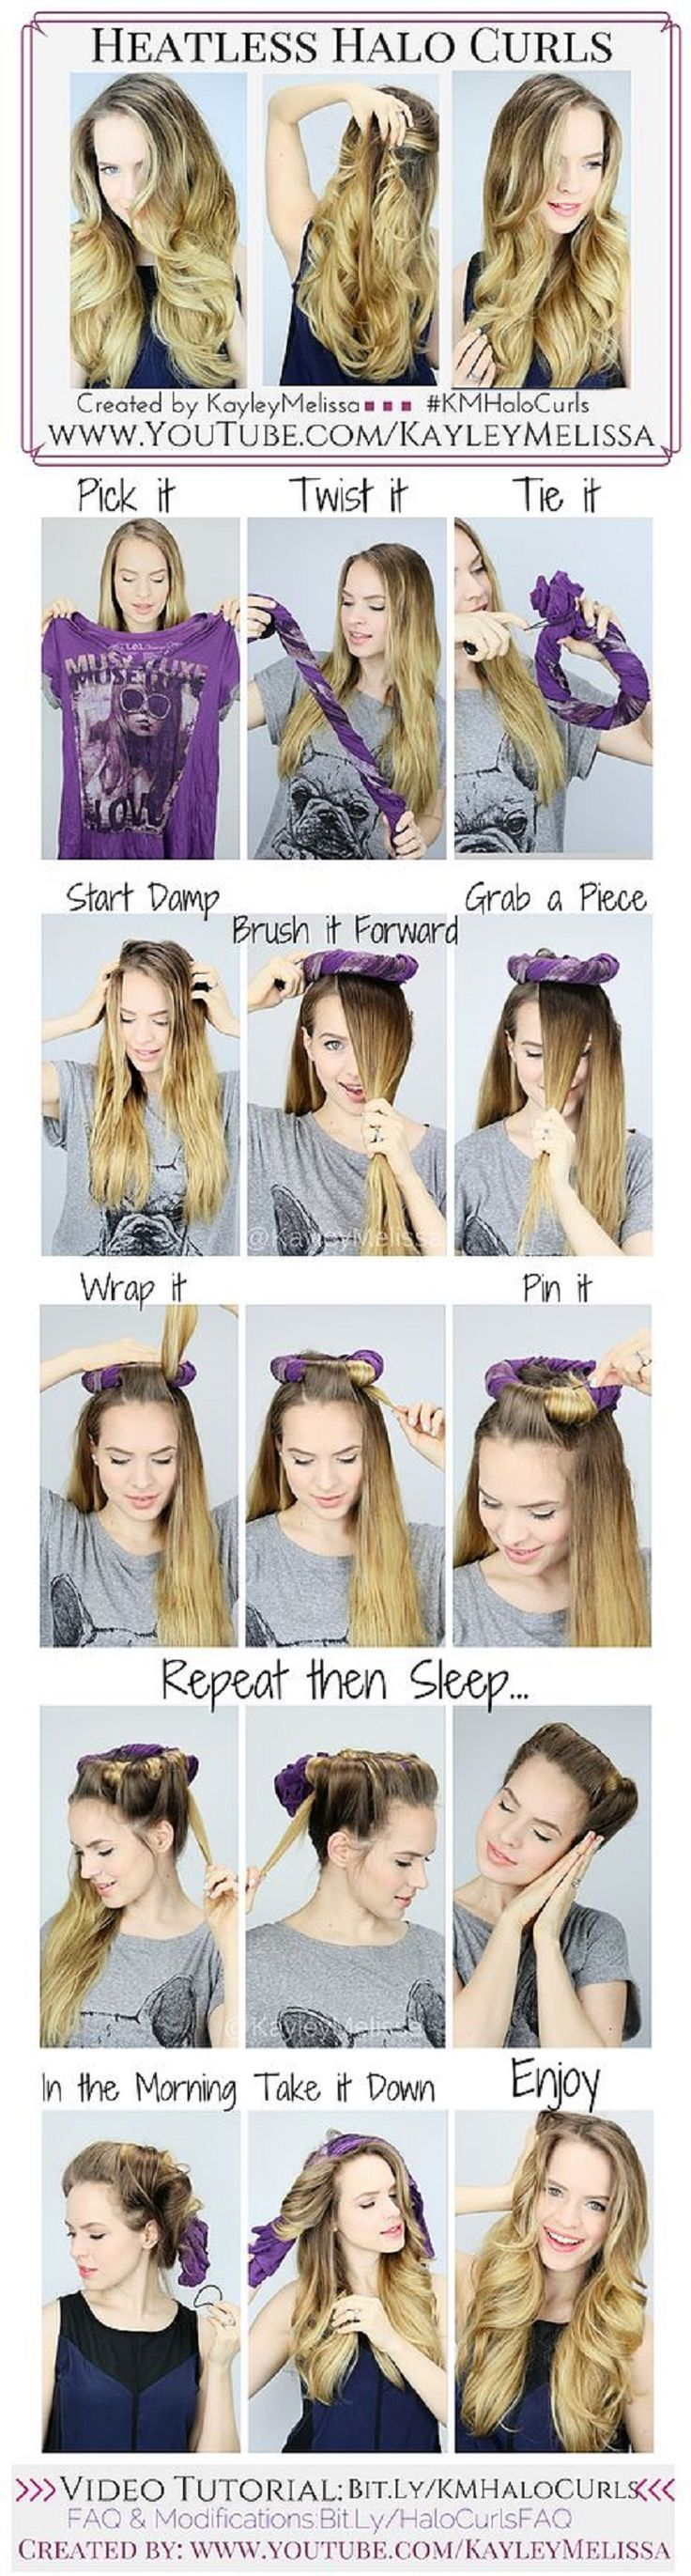 cool 16 Perfect Beach Wavy Hair Tutorials by http://www.dana-haircuts.xyz/hair-tutorials/16-perfect-beach-wavy-hair-tutorials/